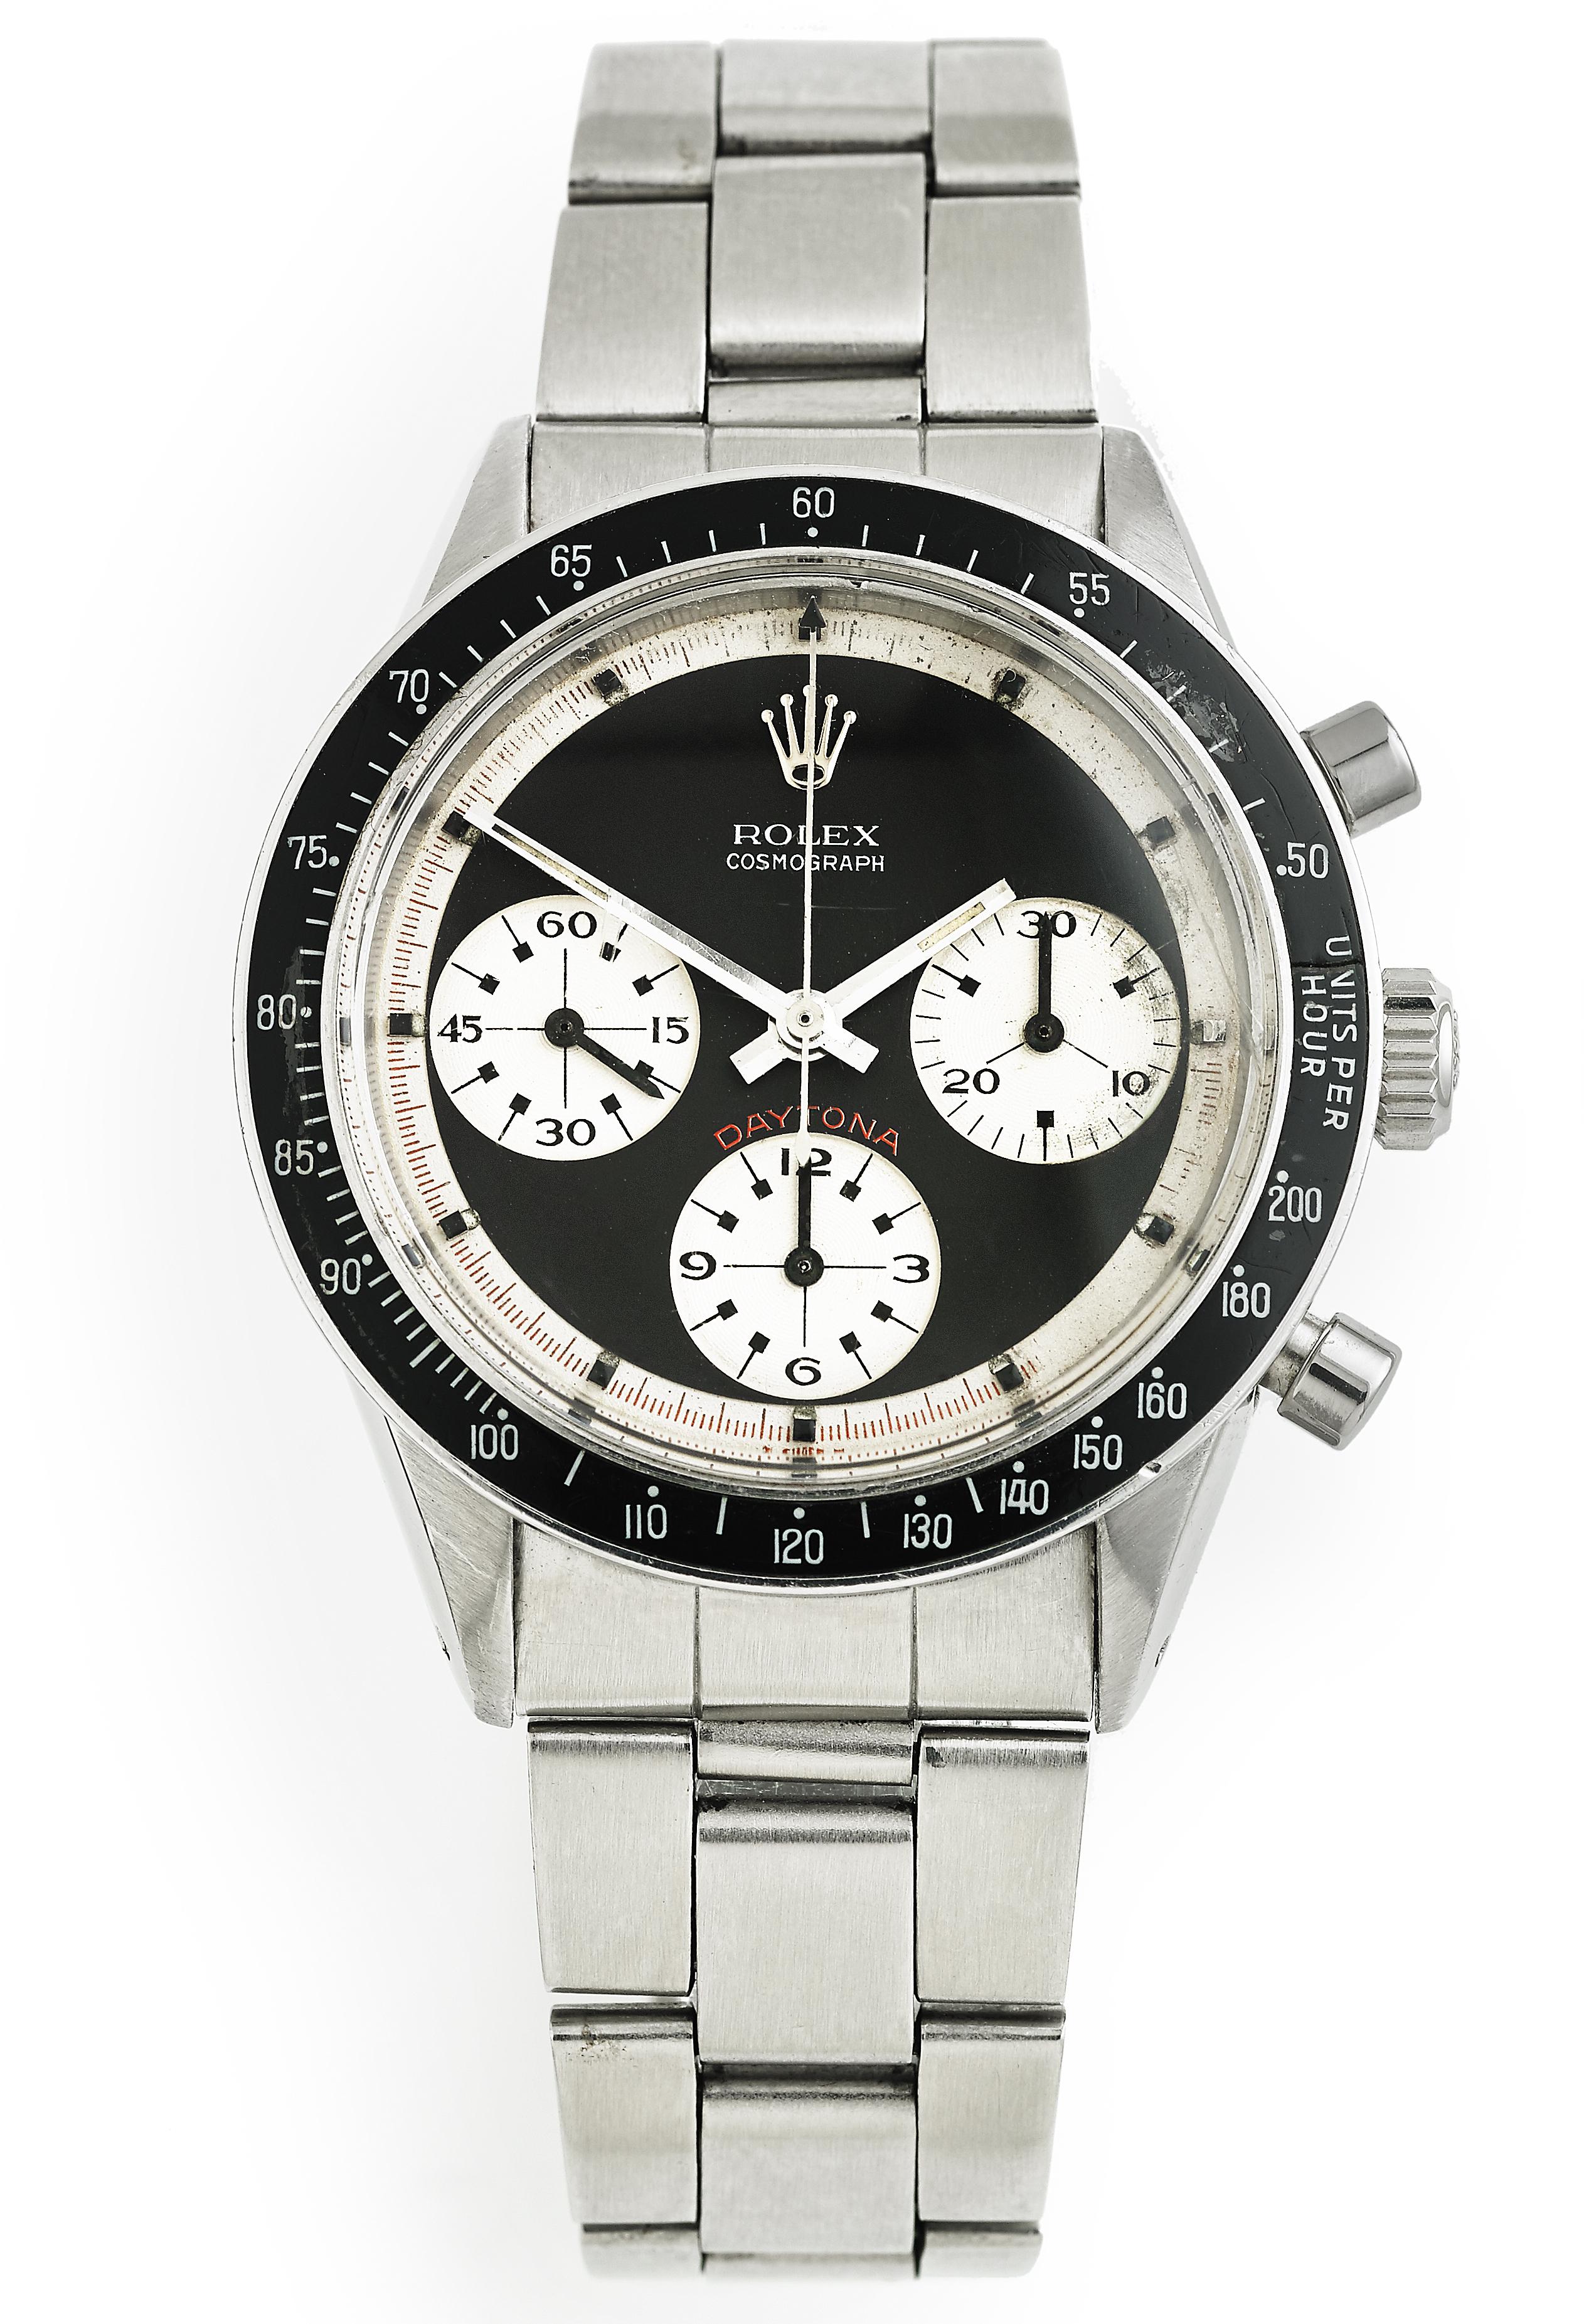 Rolex Paul Newman panda